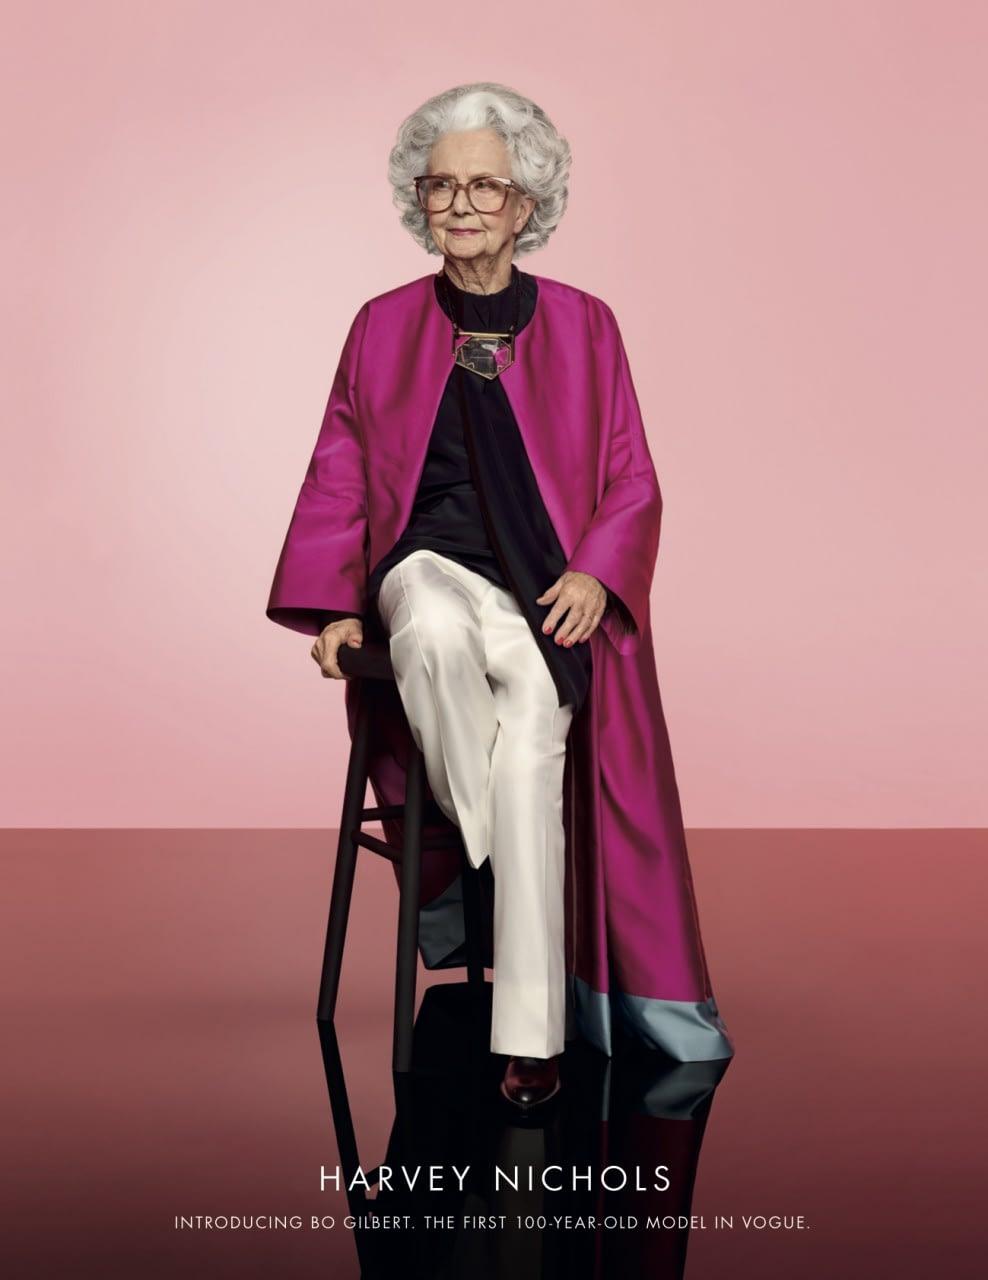 Harvey Nichols: 100 year-old model